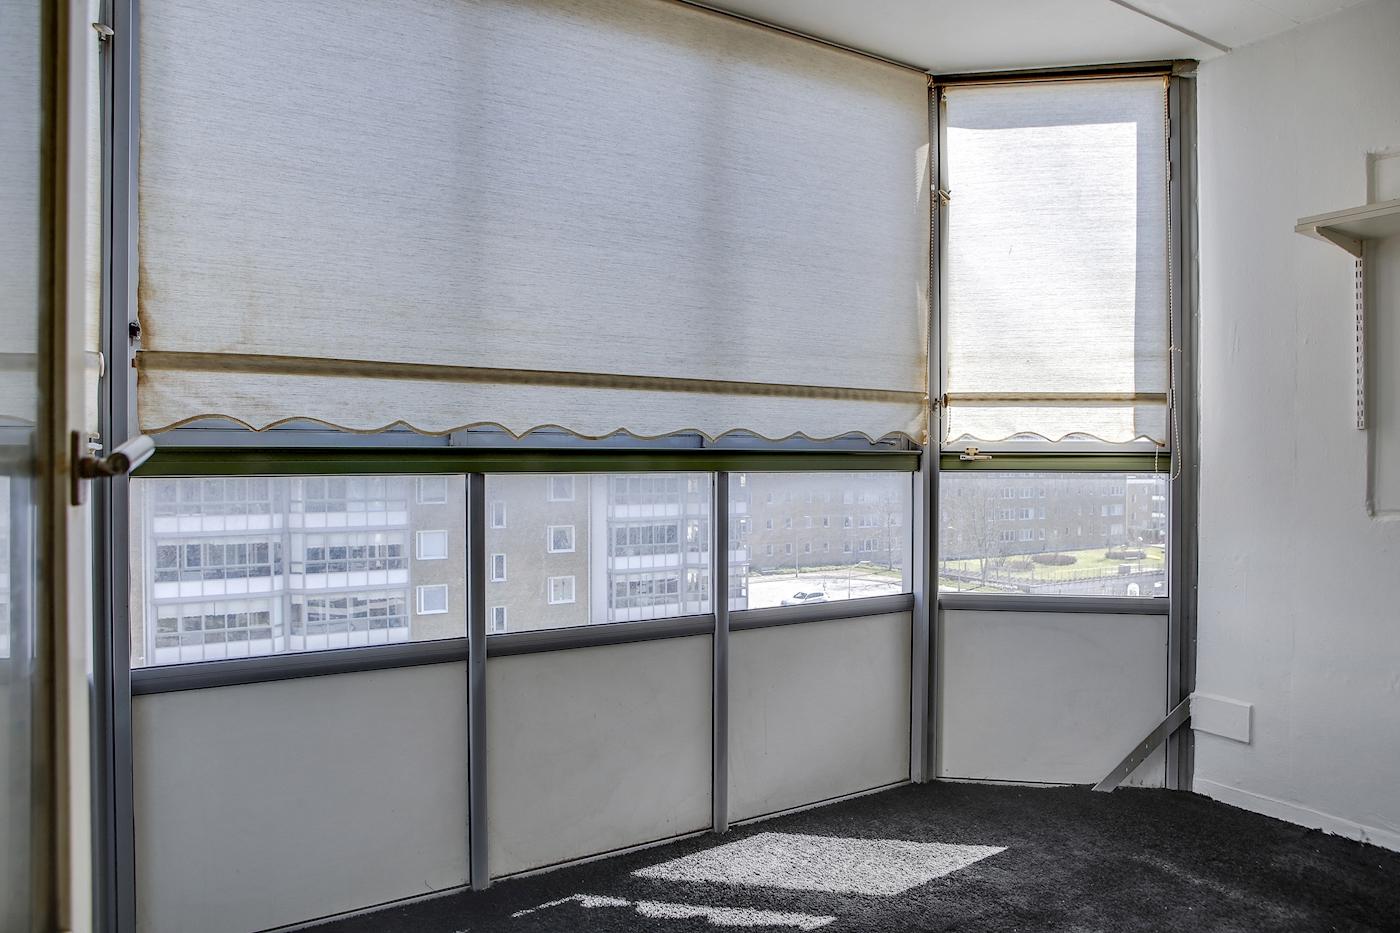 Inglasad balkong i sydostläge